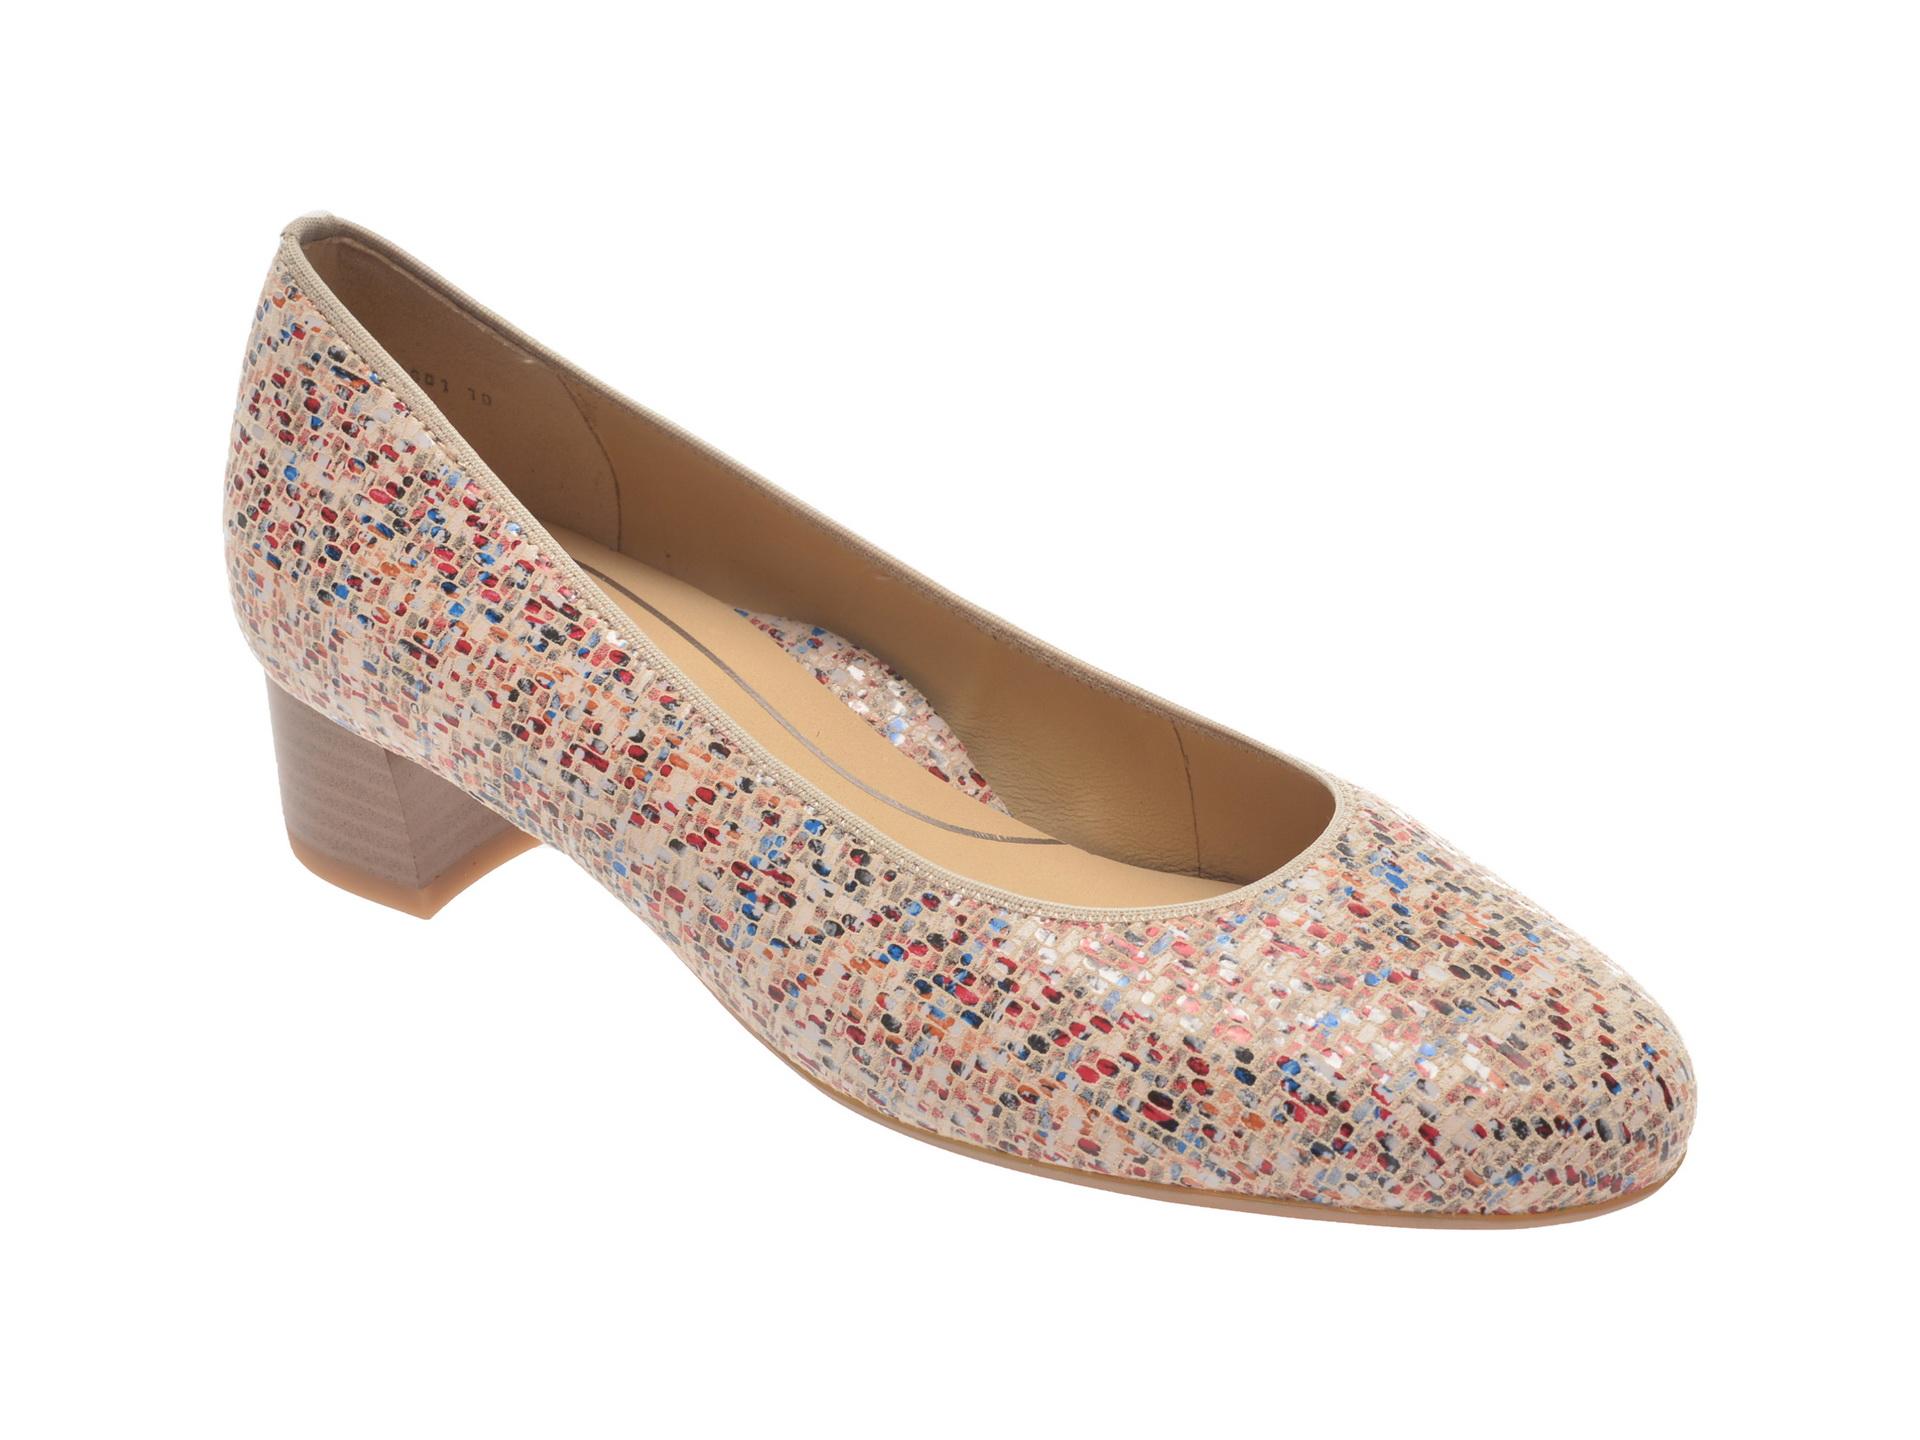 Pantofi ARA bej, 16601, din piele naturala imagine